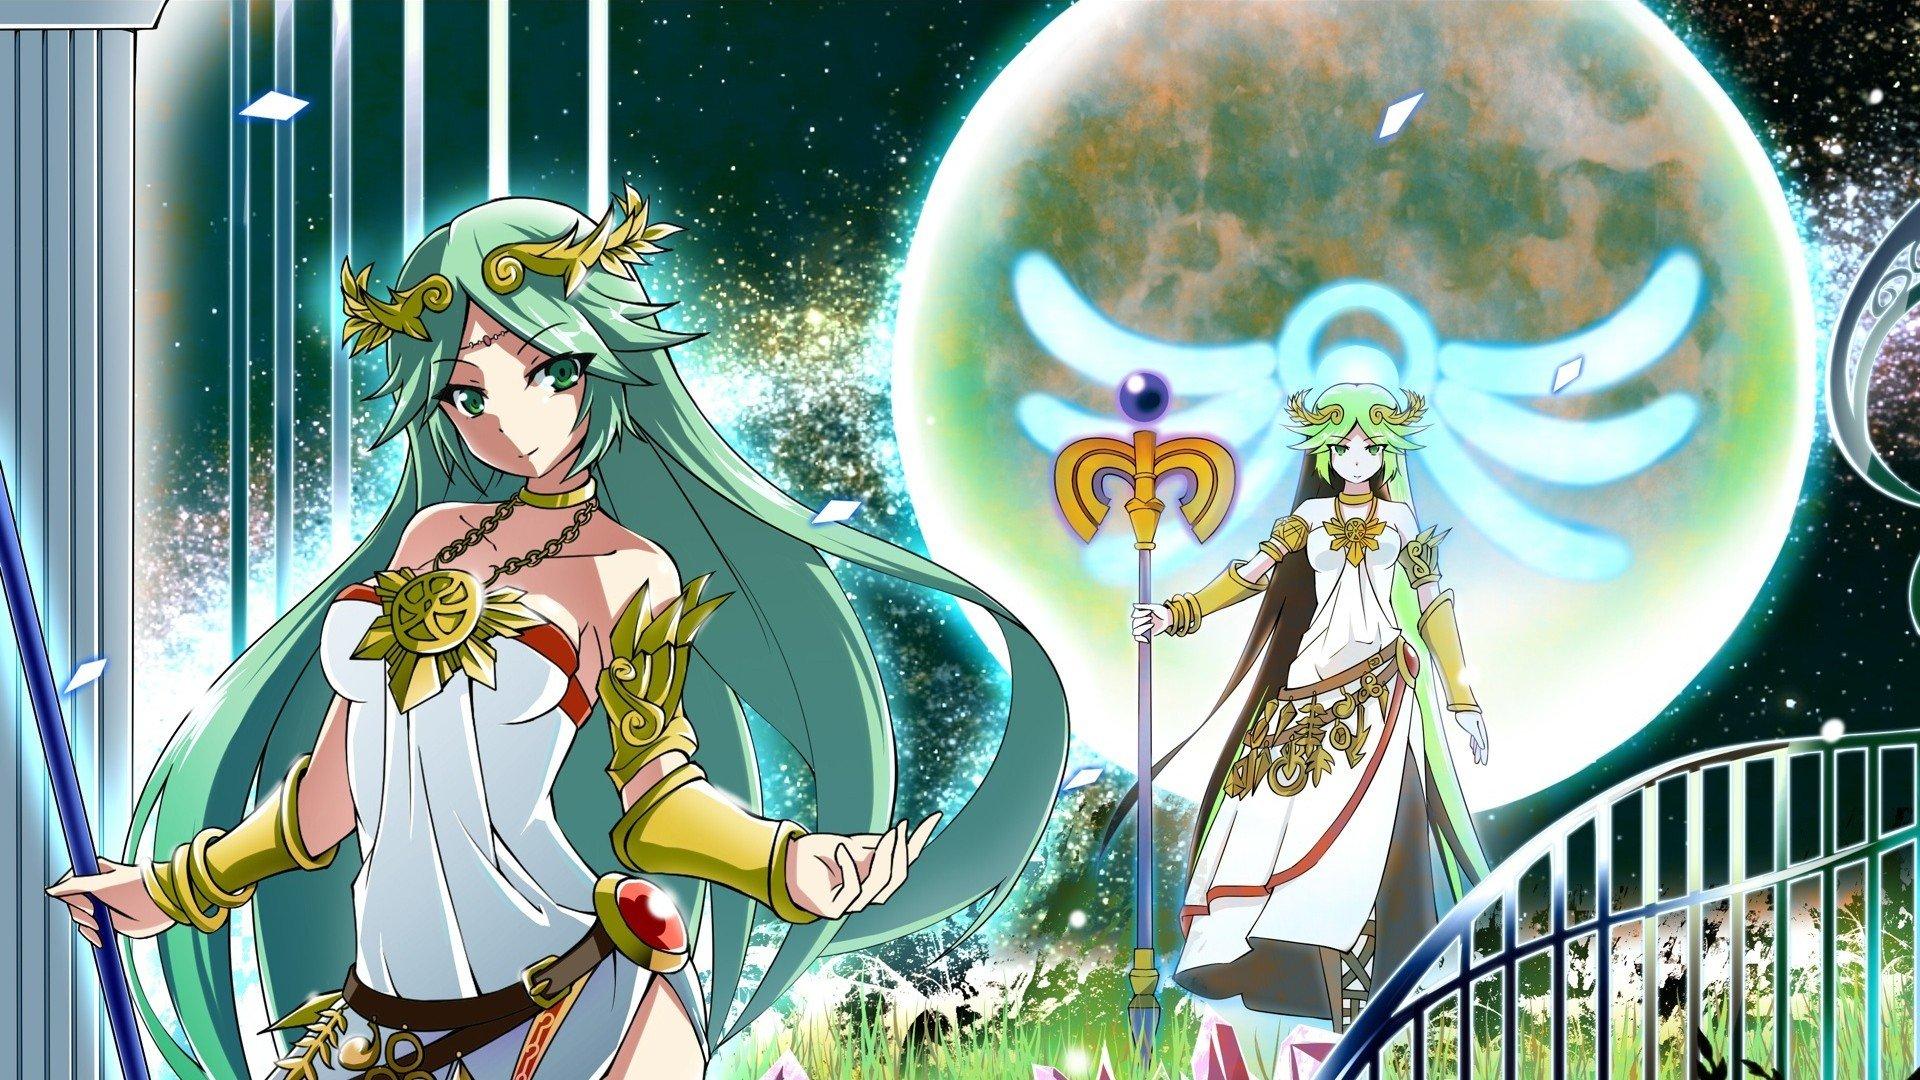 Fondos De Pantalla 1920x1080 Px Chicas Anime Kid Icarus